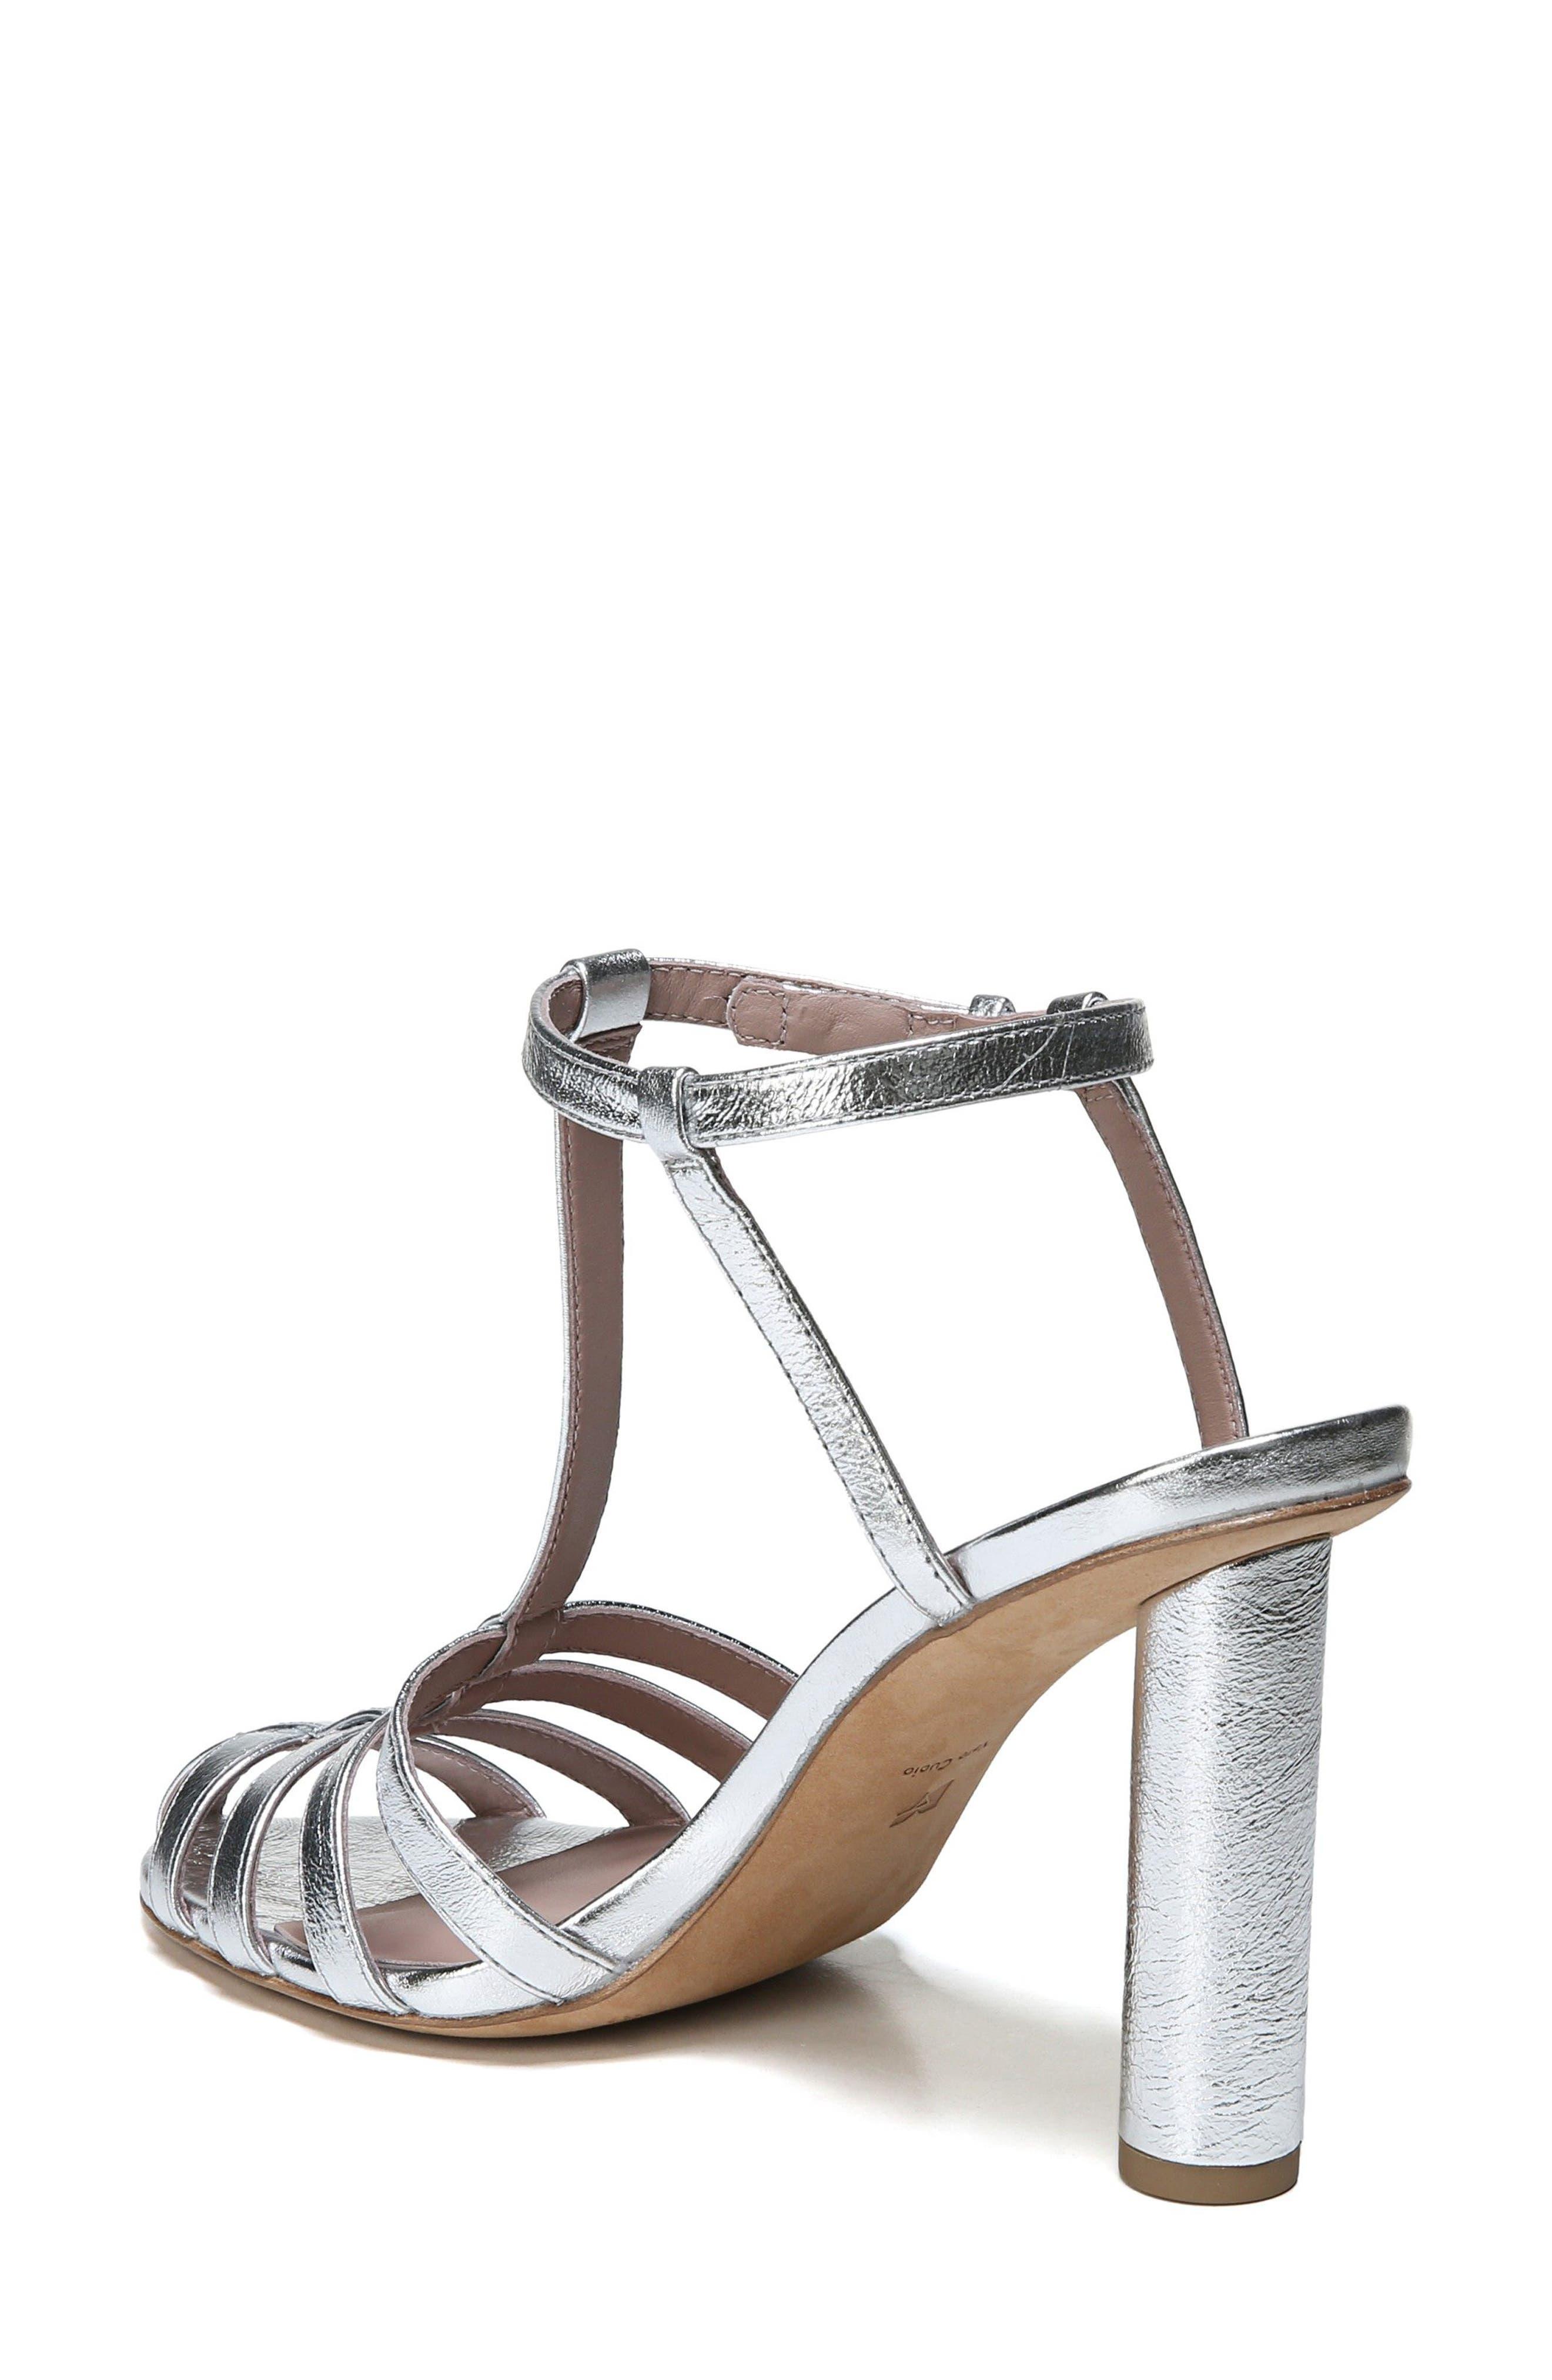 Eva T-Strap Sandal,                             Alternate thumbnail 2, color,                             Metallic Silver